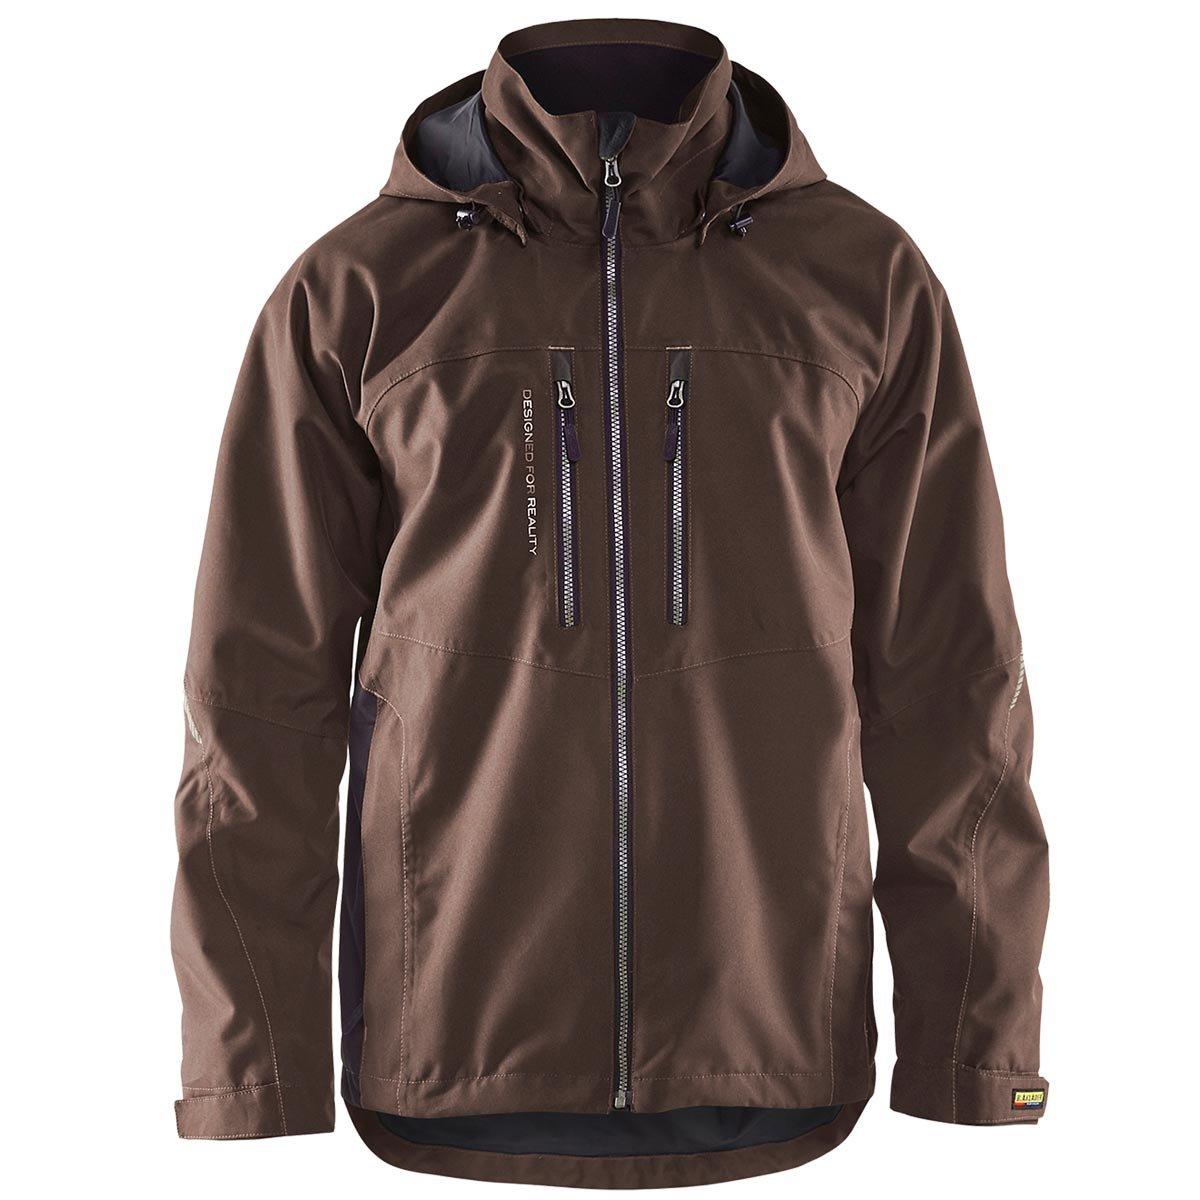 Blakl/äder 4890197799006XL Winter Jacket Size 6XL in Black 6X-Large